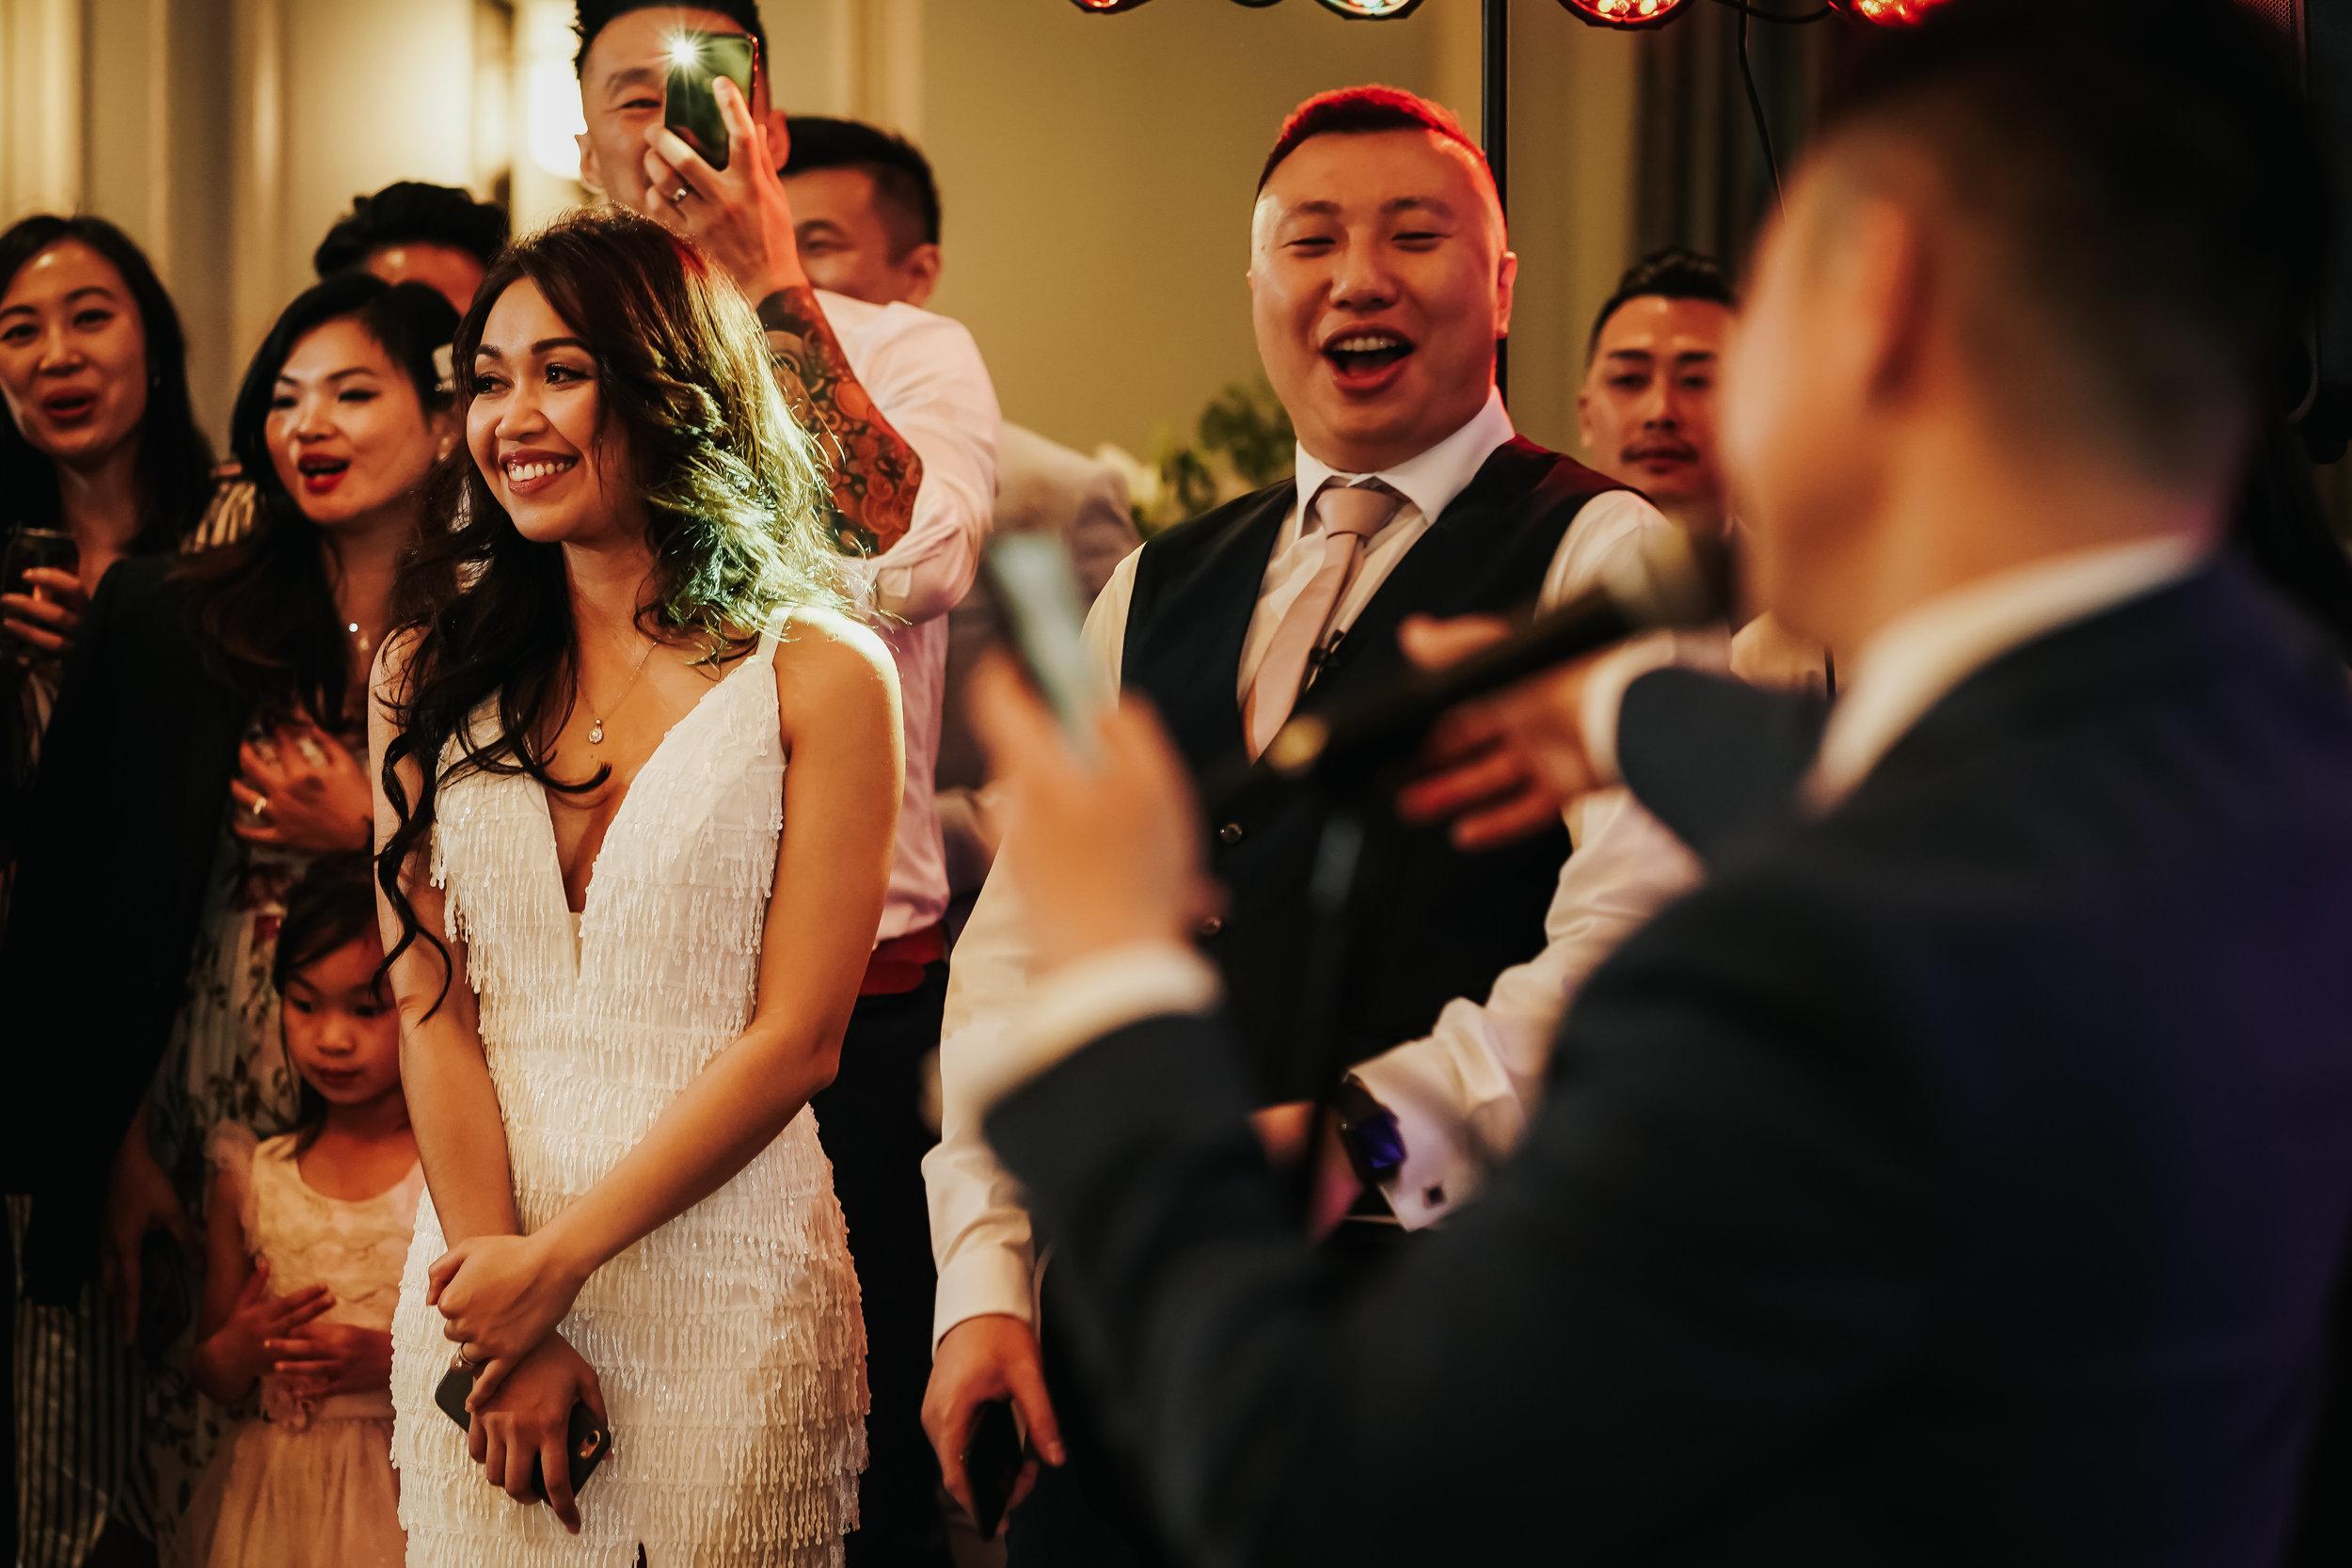 Chinese Wedding Photography Manchester wedding photographer Cheshire - 052.jpg